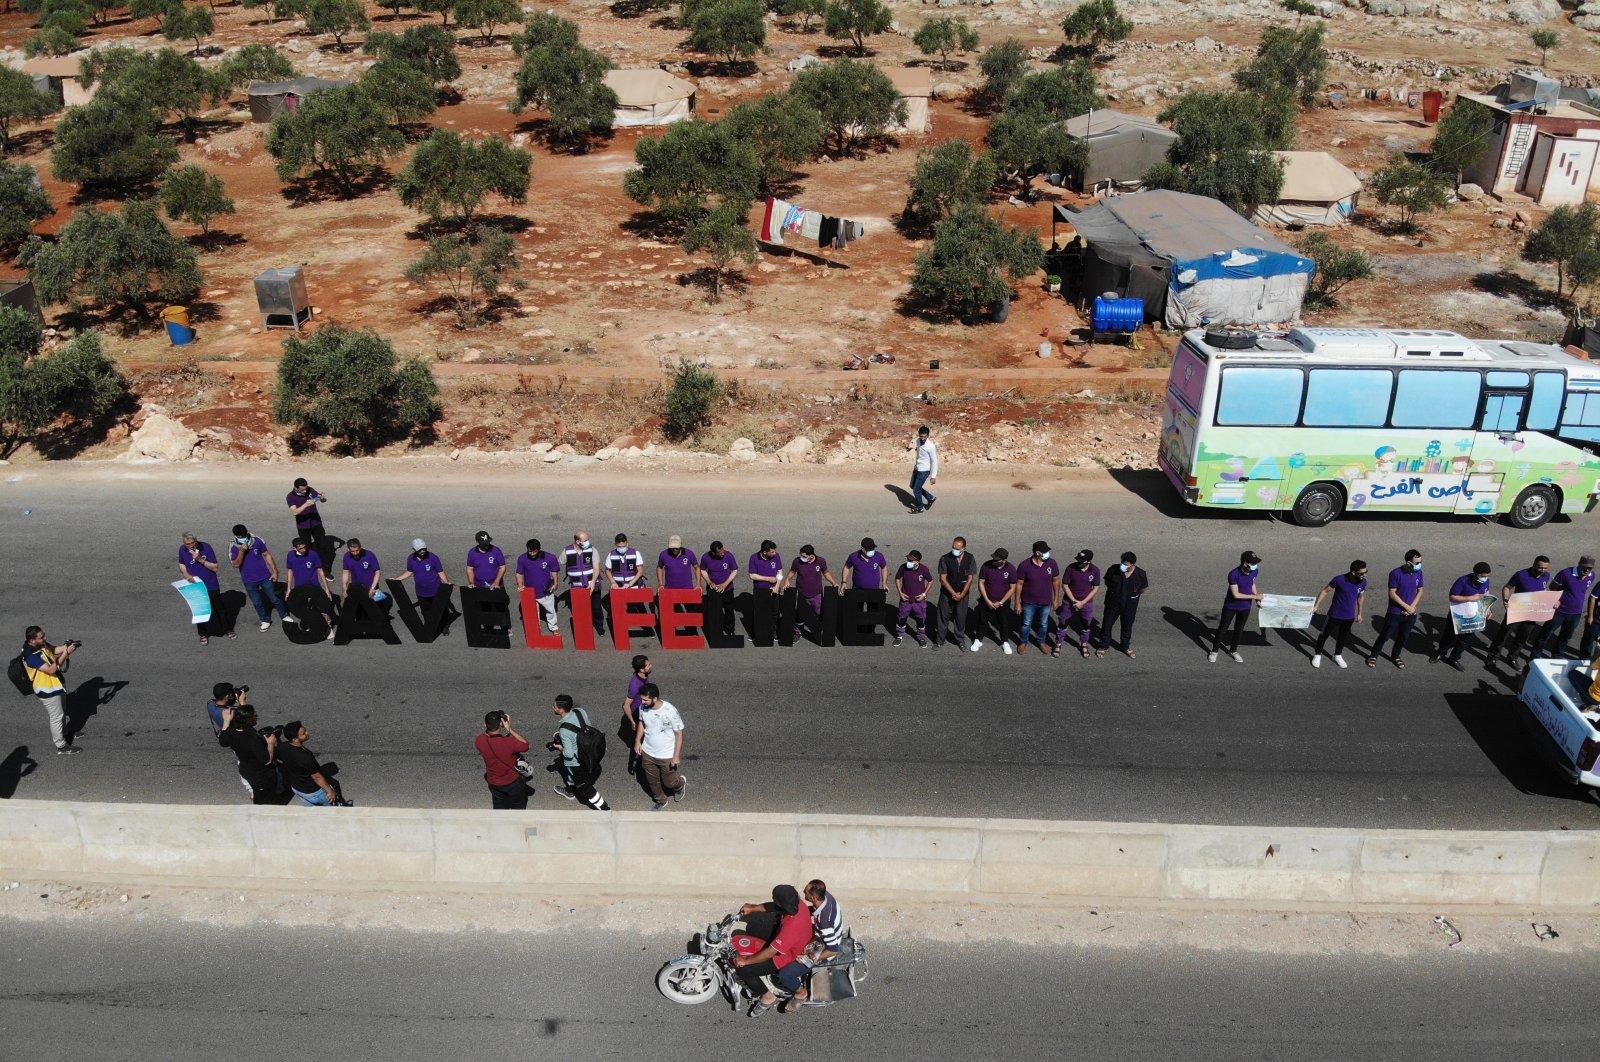 Activists and workers from civil society, humanitarian and medical aid organizations form a human chain calling on the international community to maintain the cross-border humanitarian corridor, at the Bab Al-Hawa border crossing, Idlib, Syria, July 2, 2021. (EPA Photo)